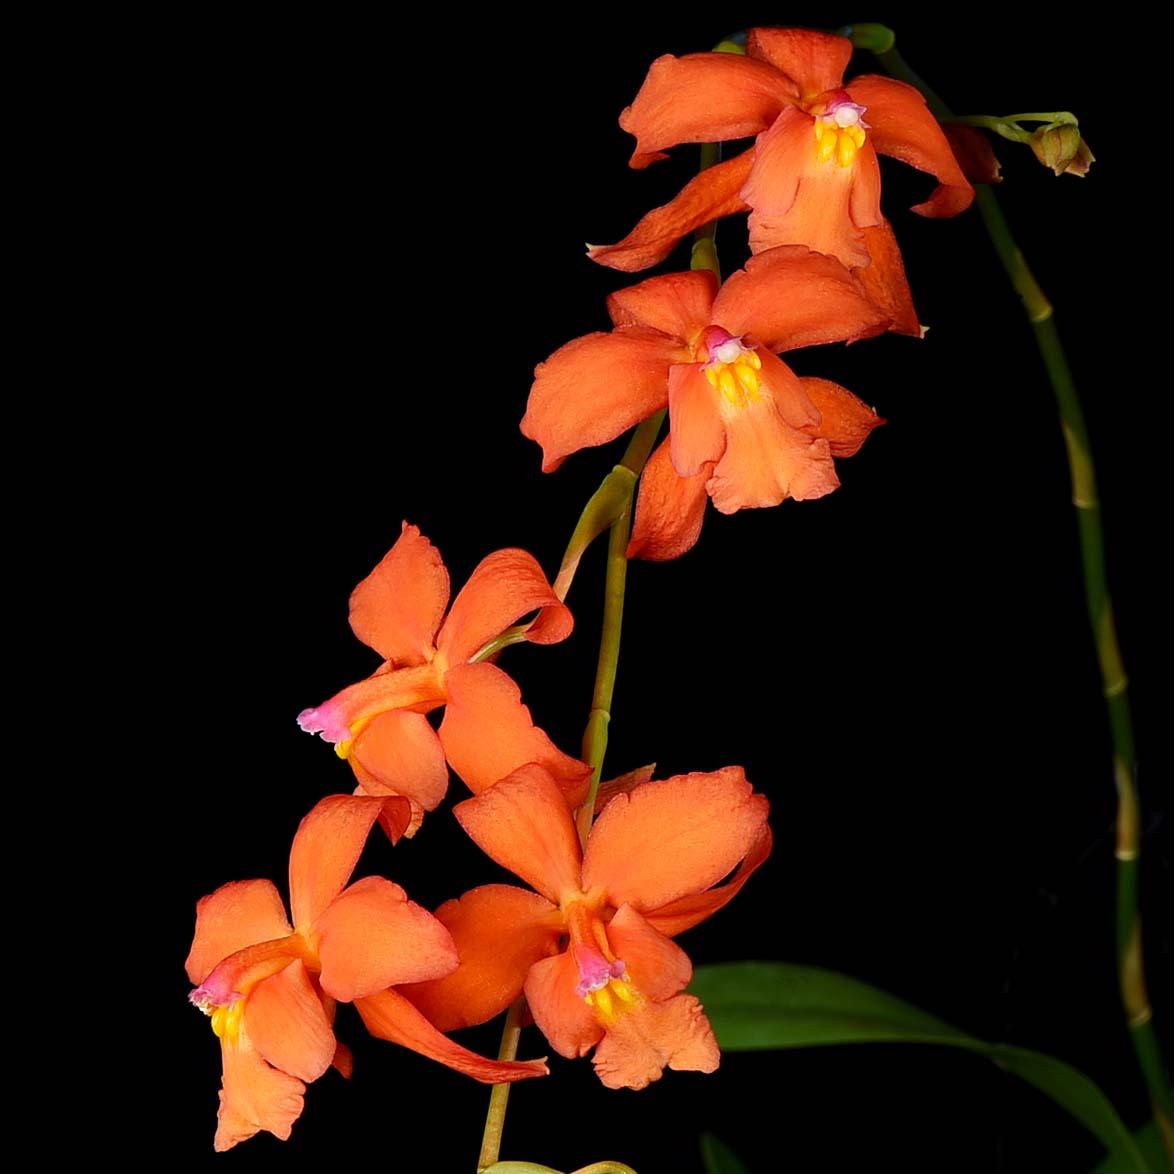 Oncidium noezlianum